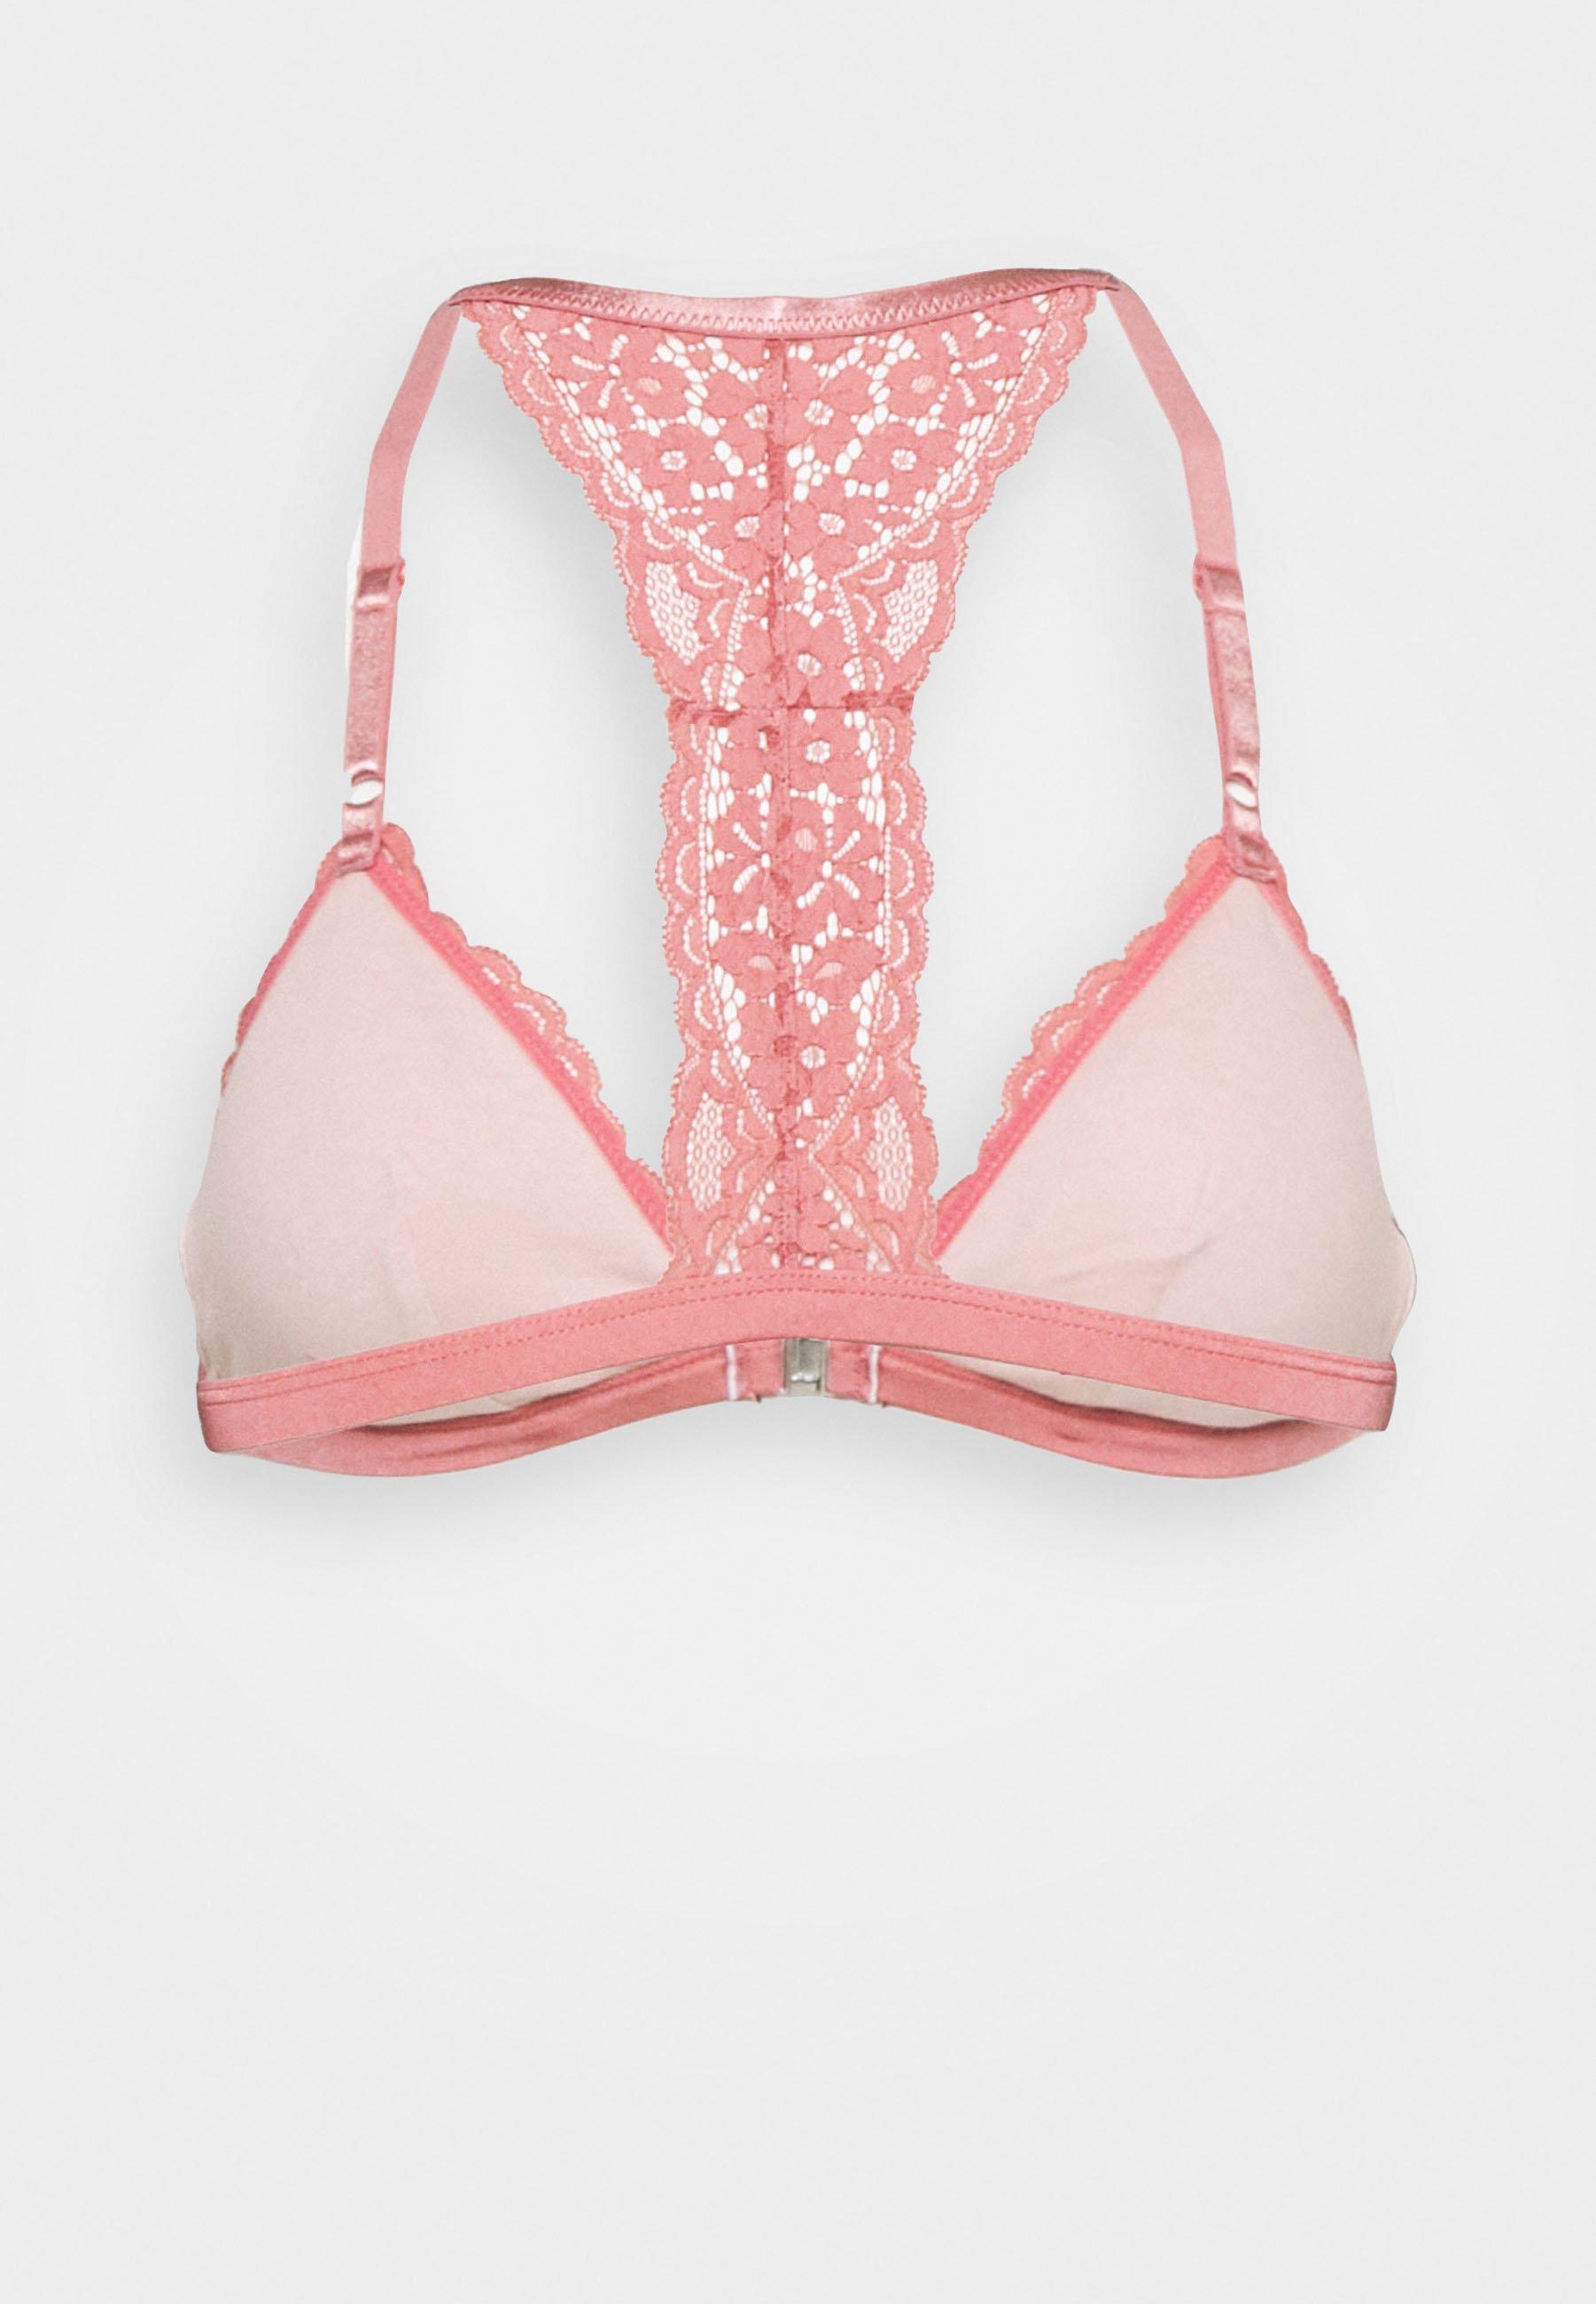 Women ROSE TRIANGLE BRALETTE - Triangle bra